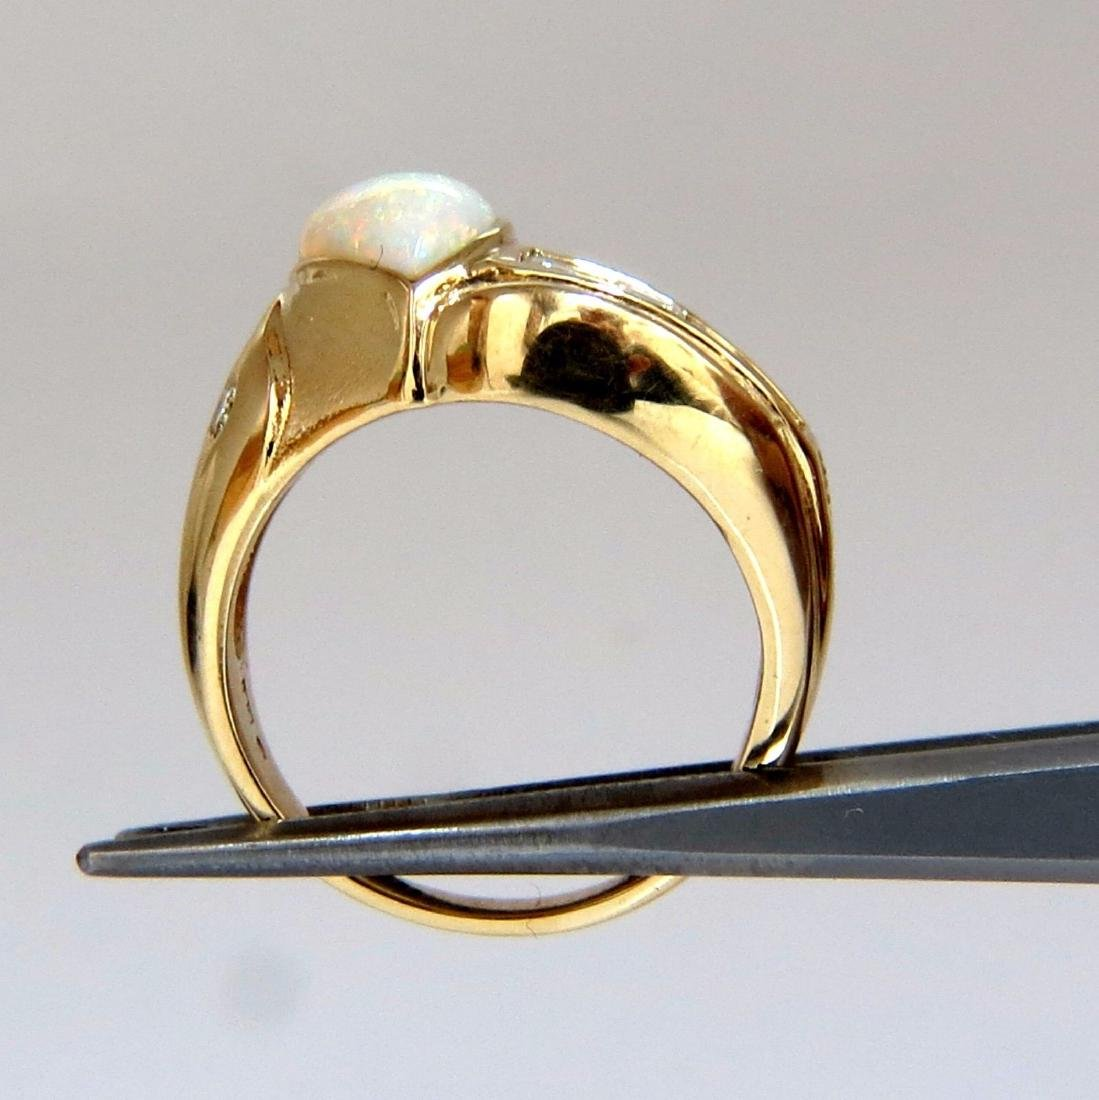 2.80ct Natural Australia Opal Diamond Ring 14kt - 4